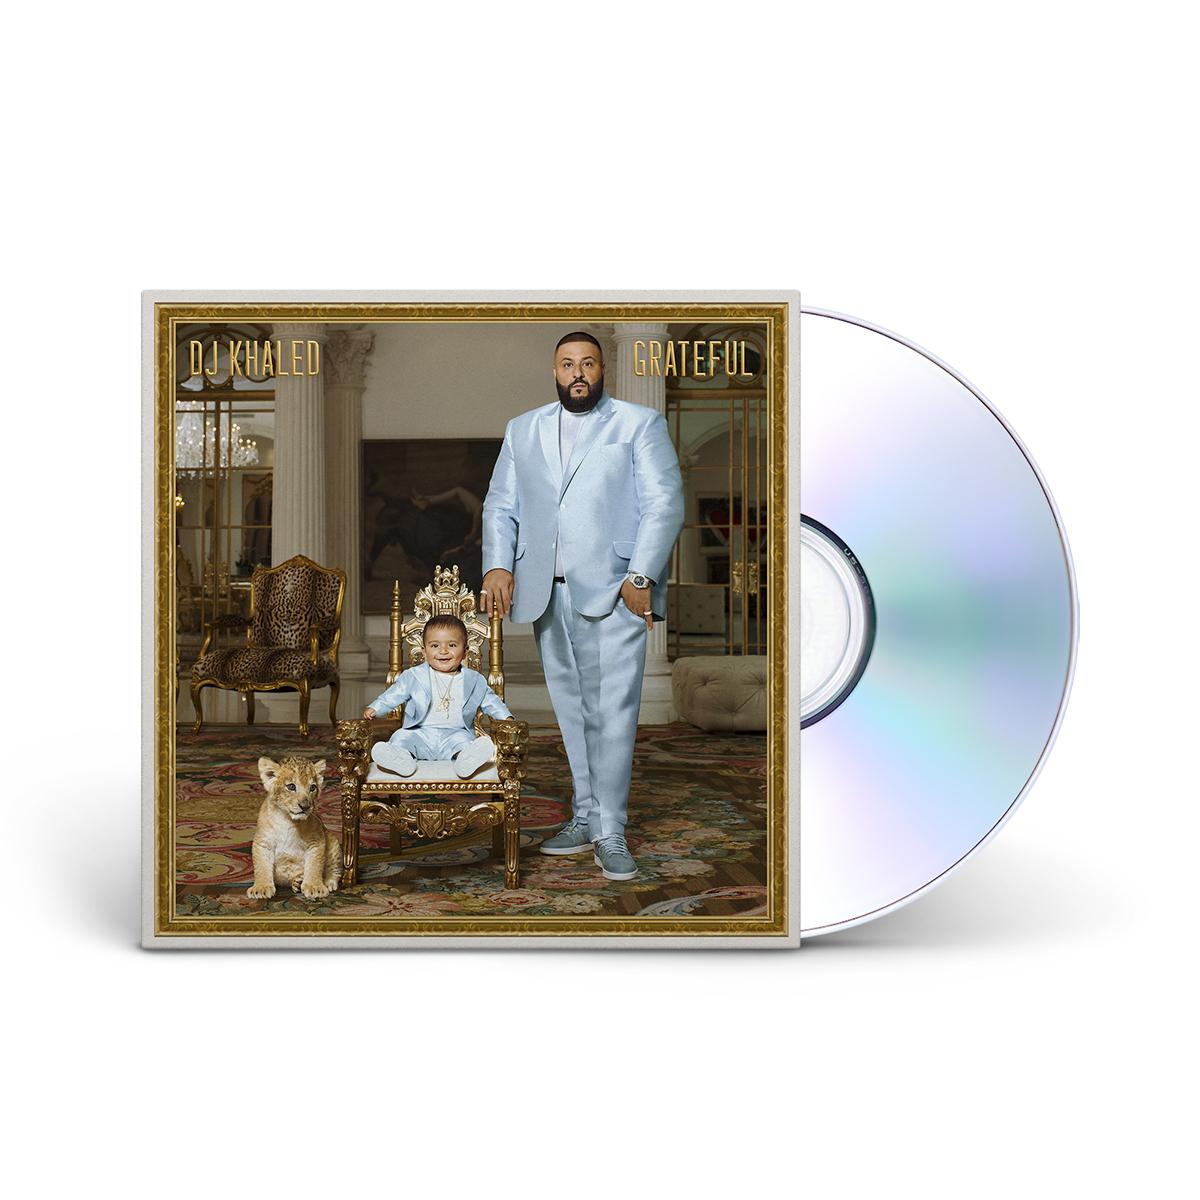 Grateful Double CD